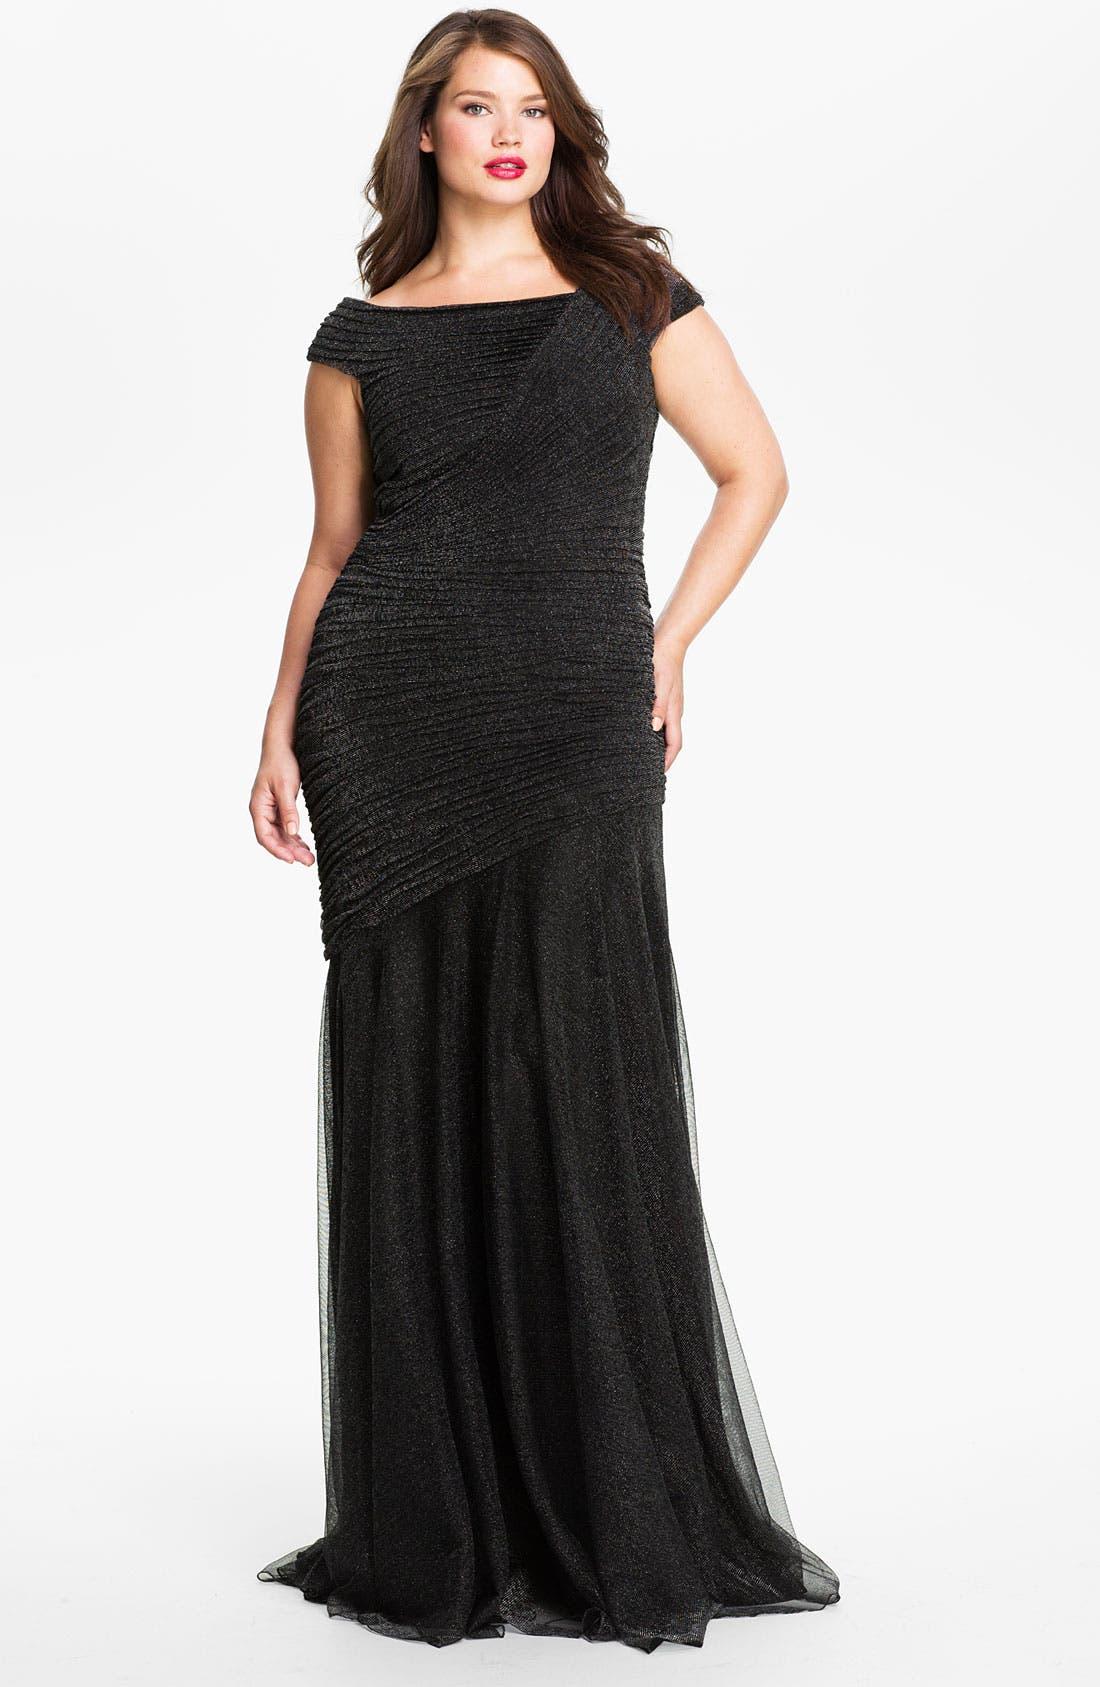 Alternate Image 1 Selected - Tadashi Shoji Ruched Metallic Gown (Plus Size)